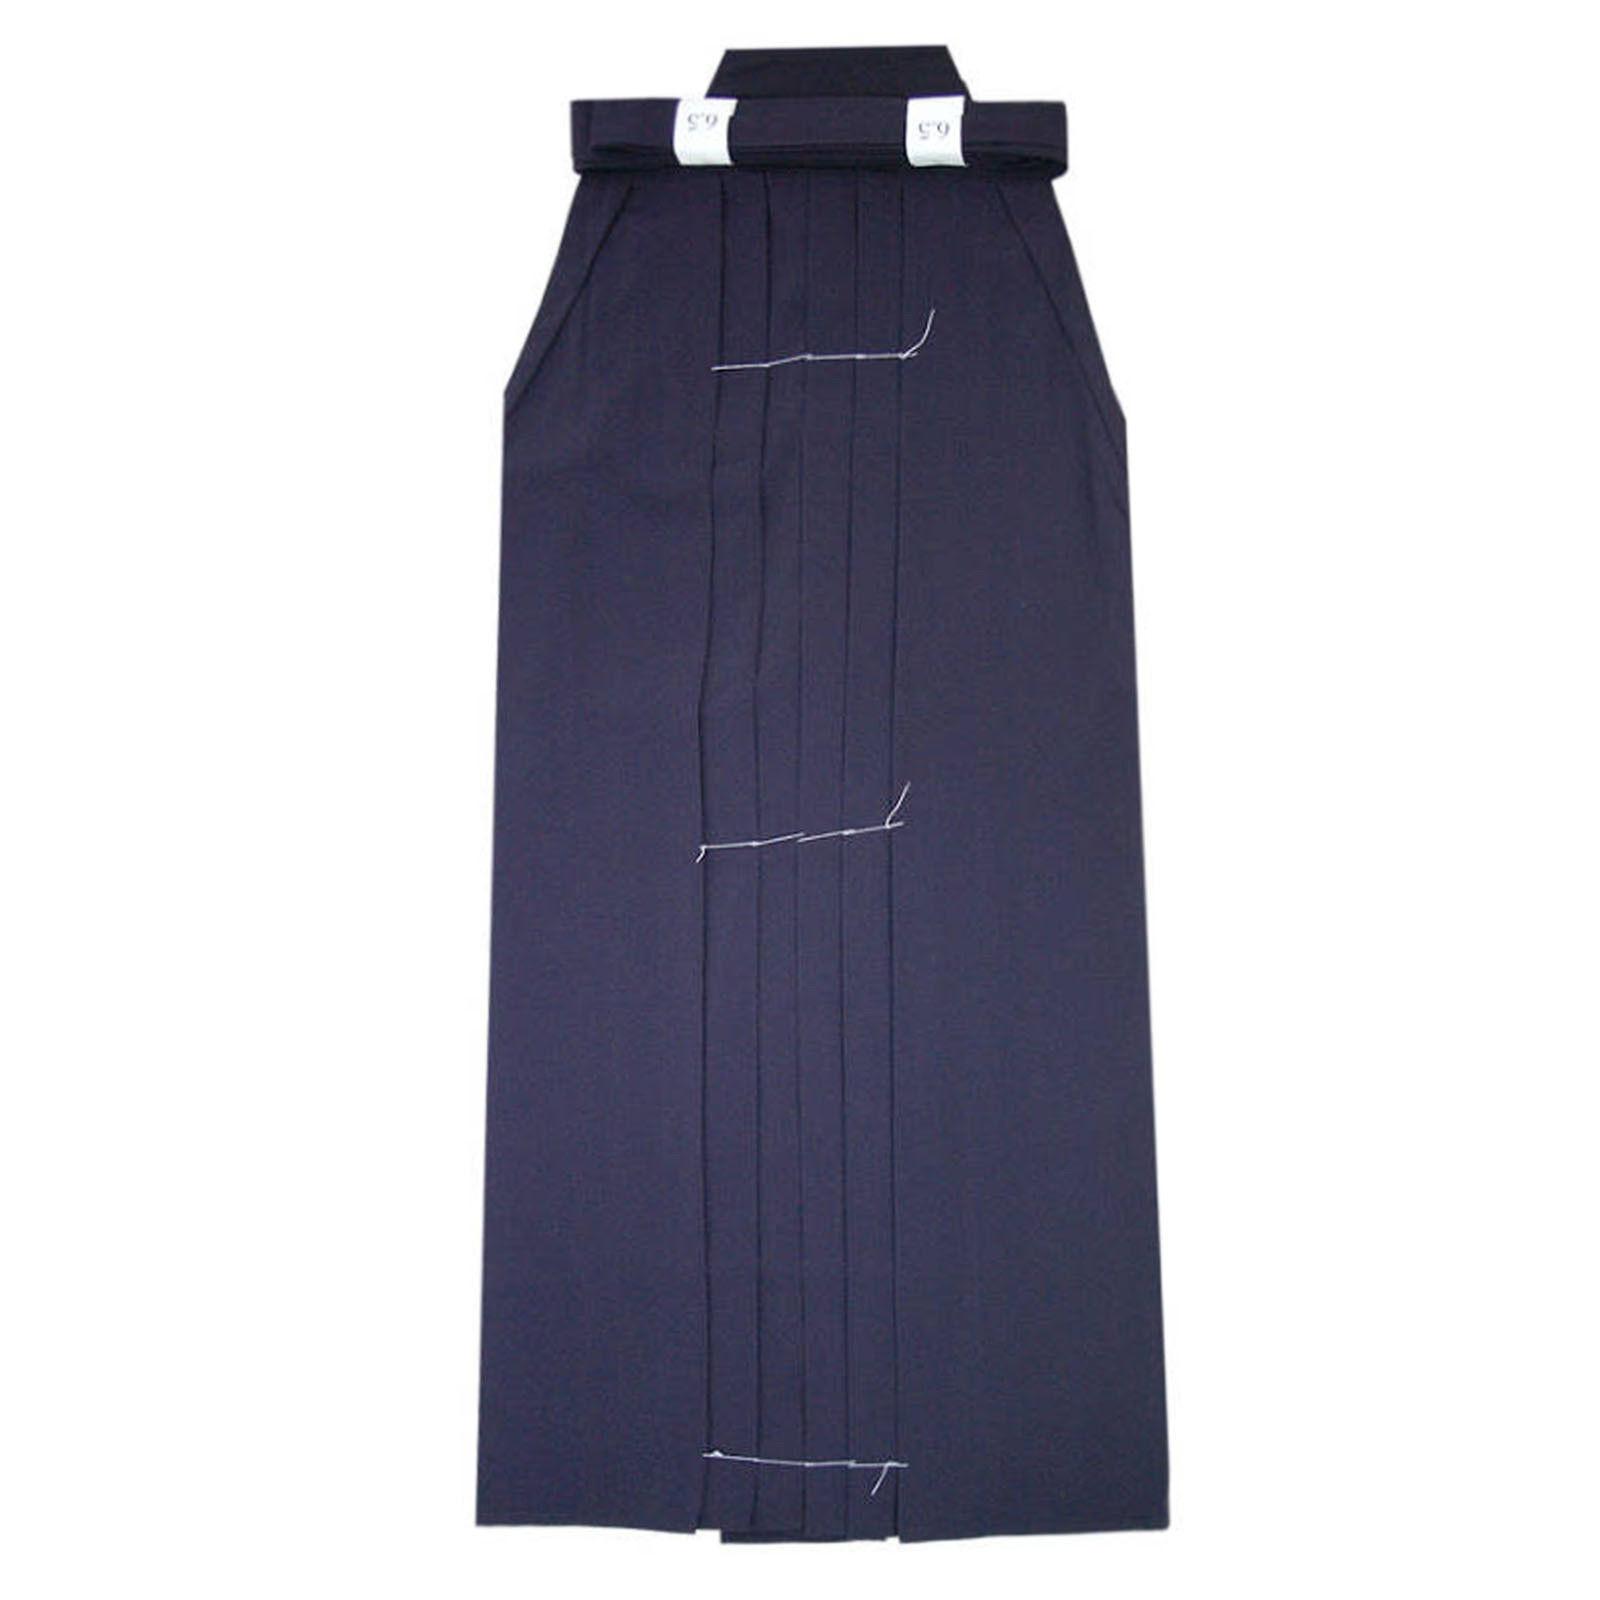 Kendo Hakama Iaido Kumdo Training Light Weight Permanent Pleat Dark bluee Uniform